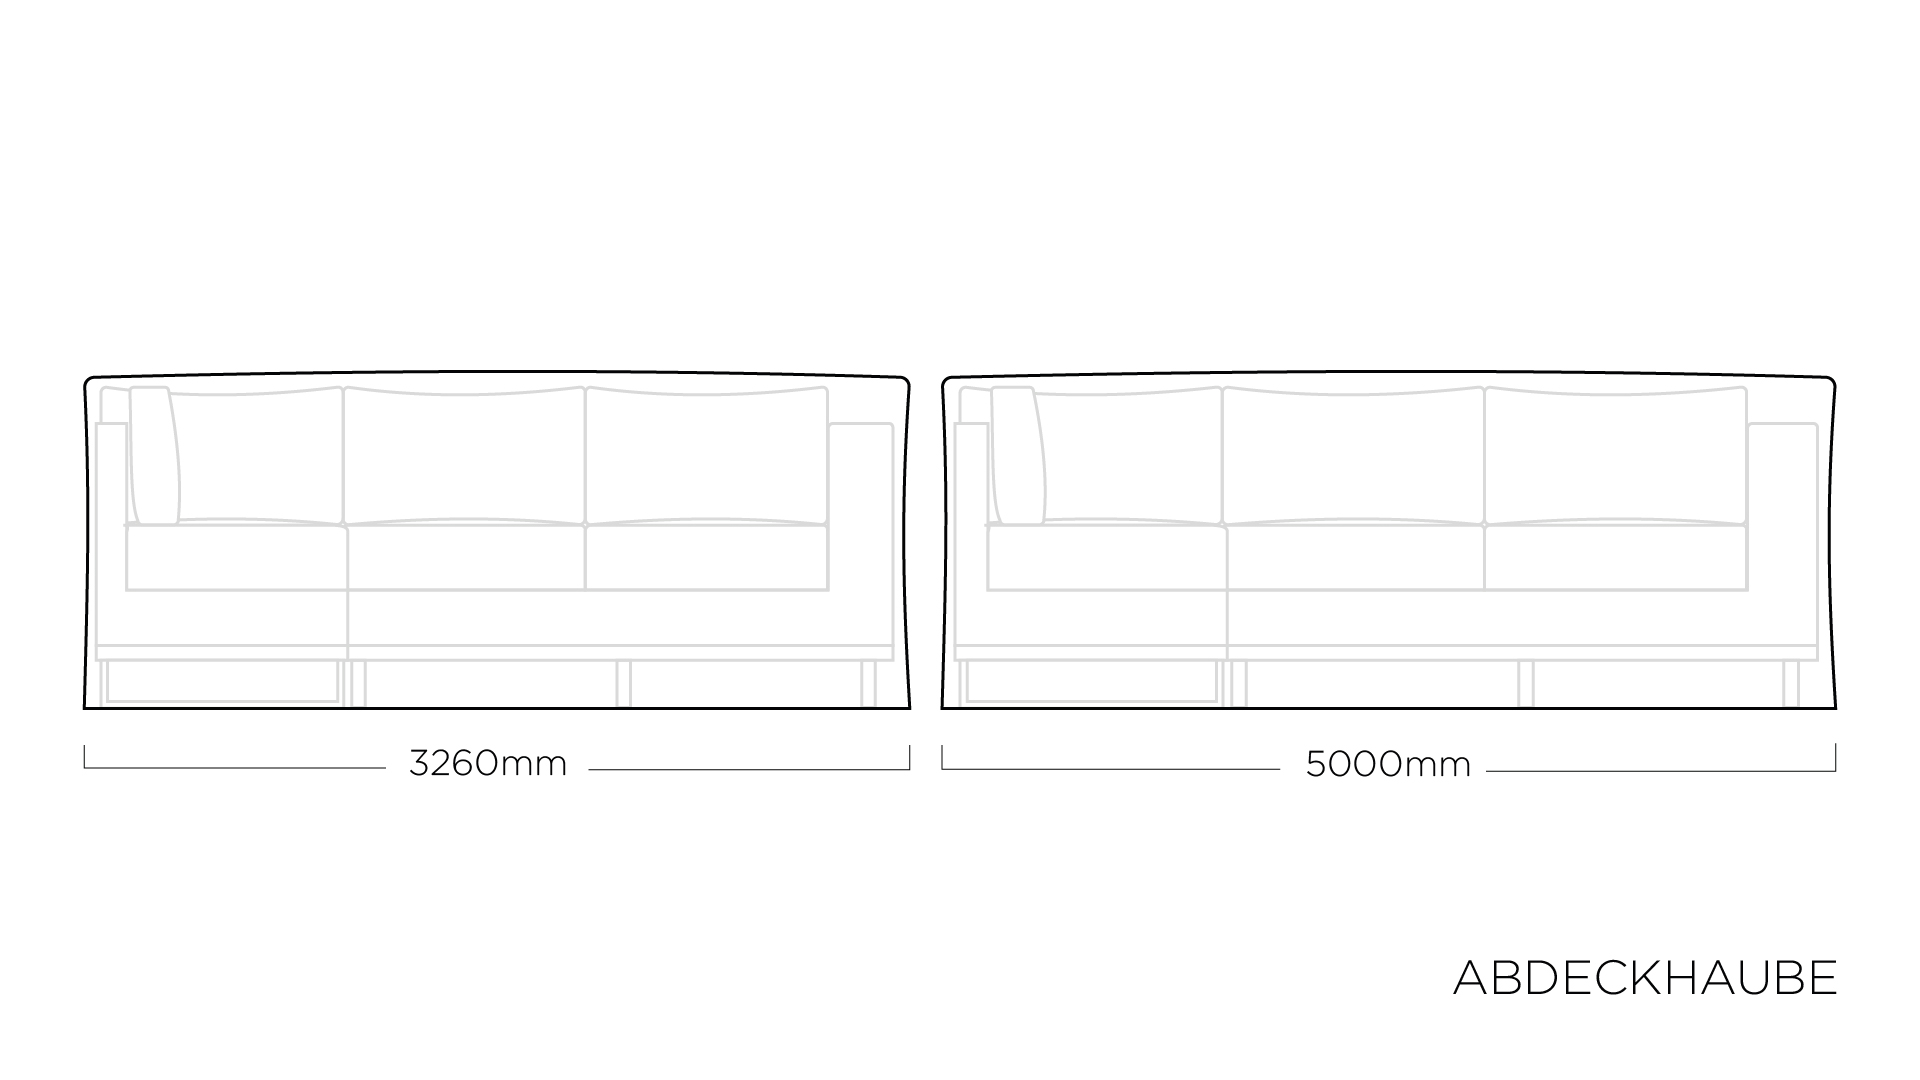 ABDECKHAUBEN Modular 326 x 500 cm